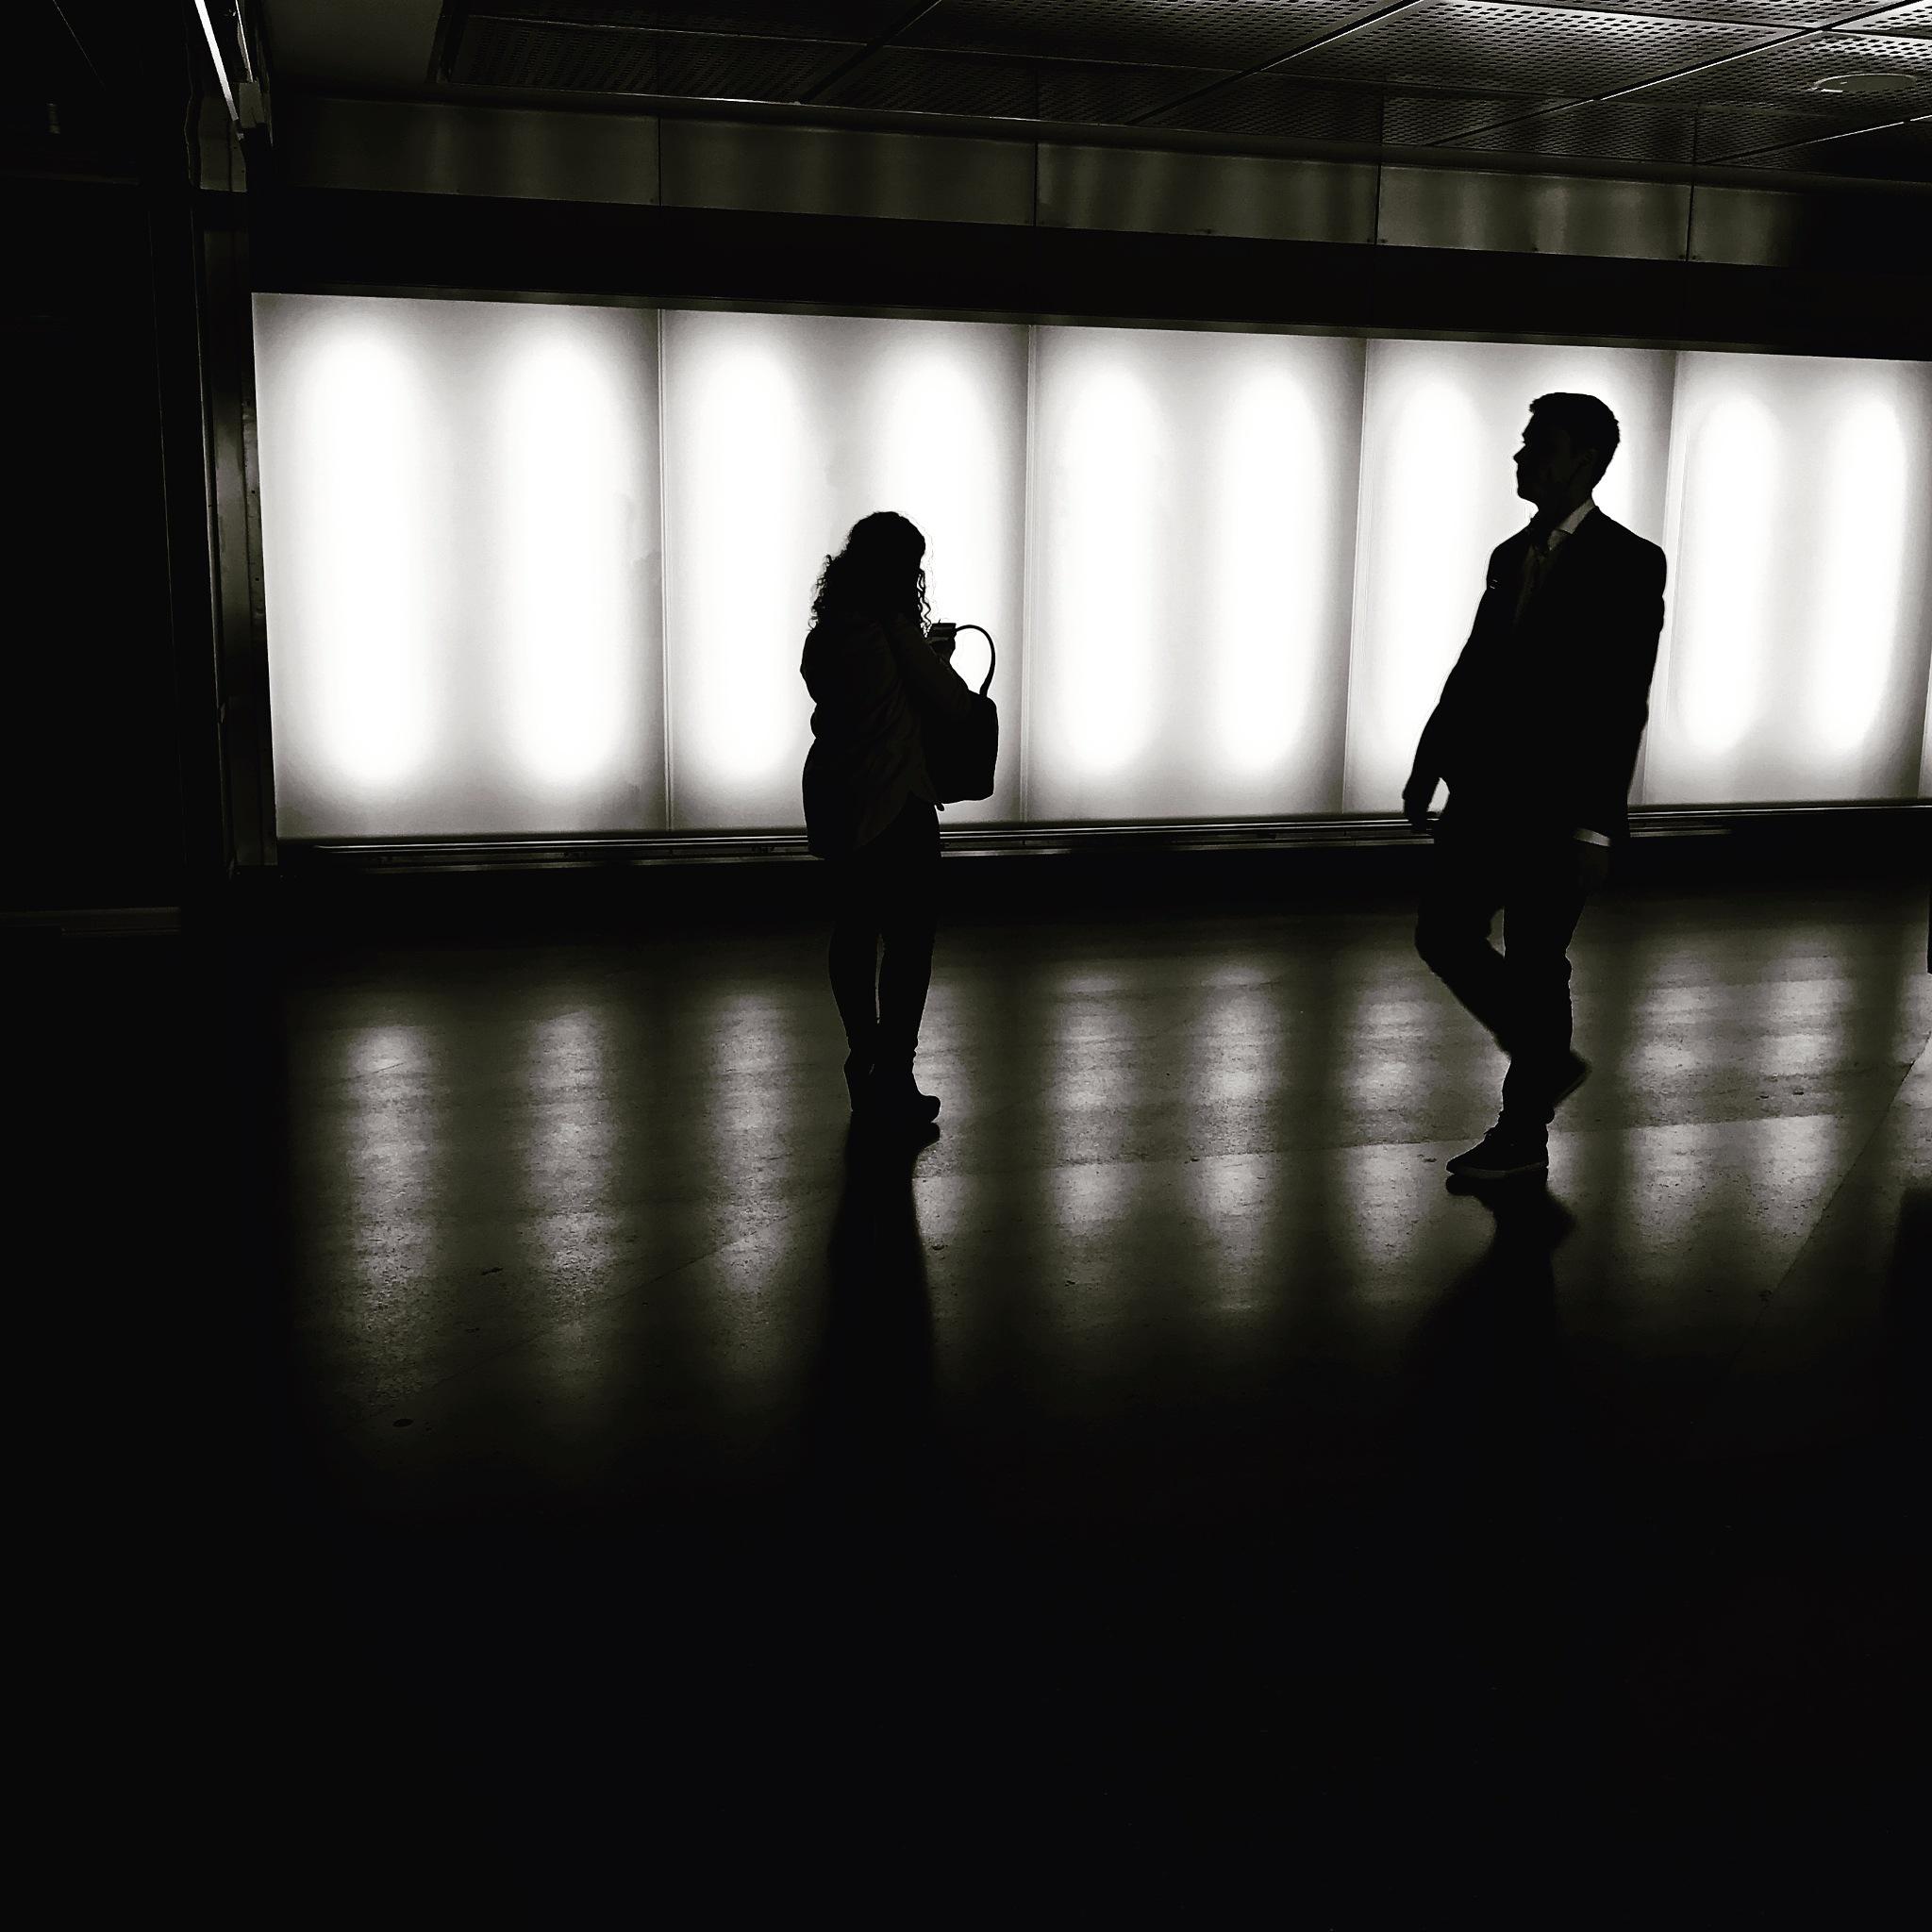 The walk by Photoankan